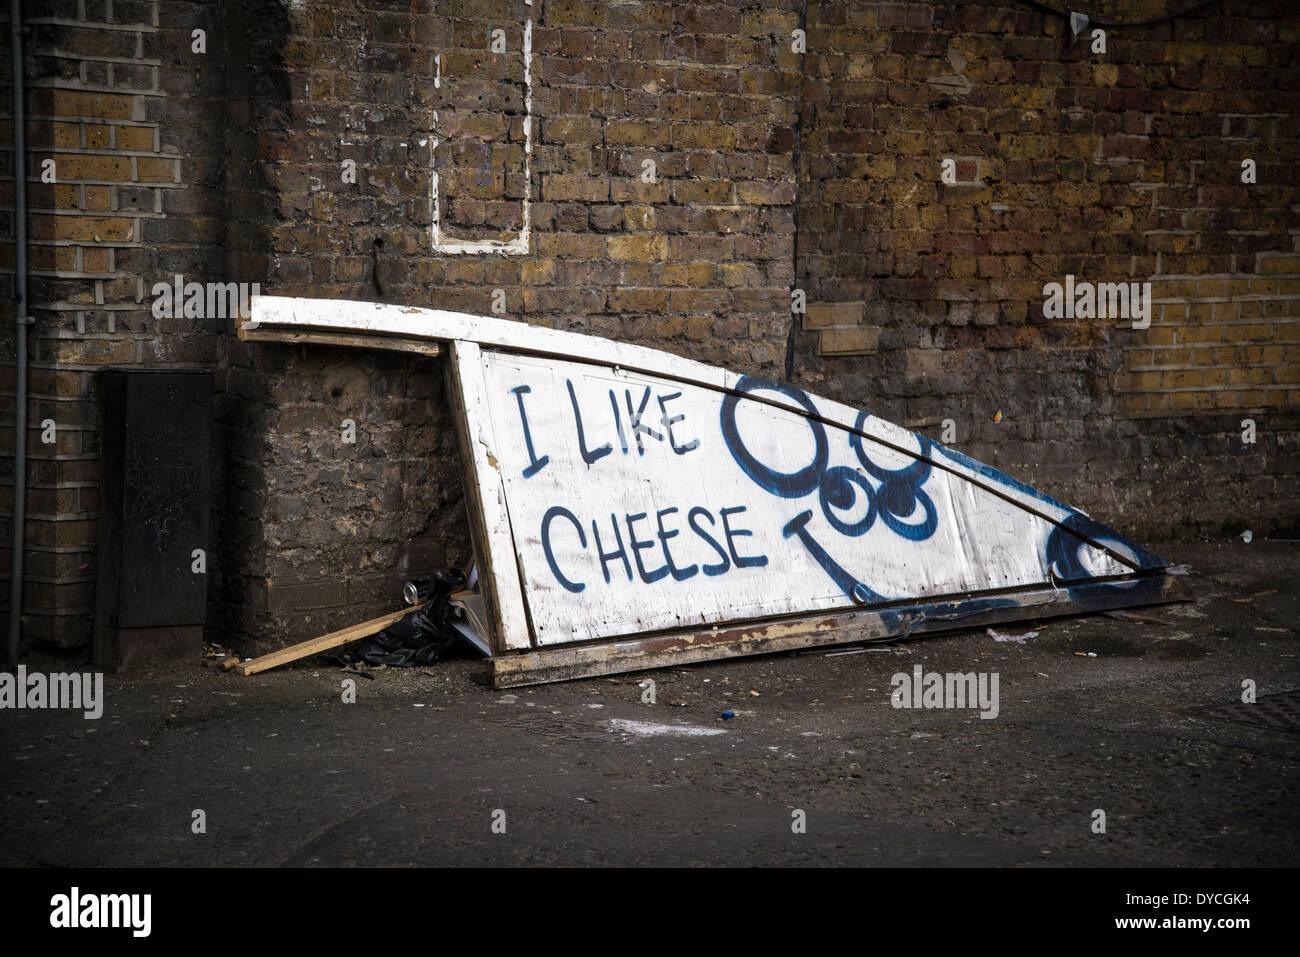 Me gusta el queso, Shoreditch, Londres, Reino Unido. Foto de stock